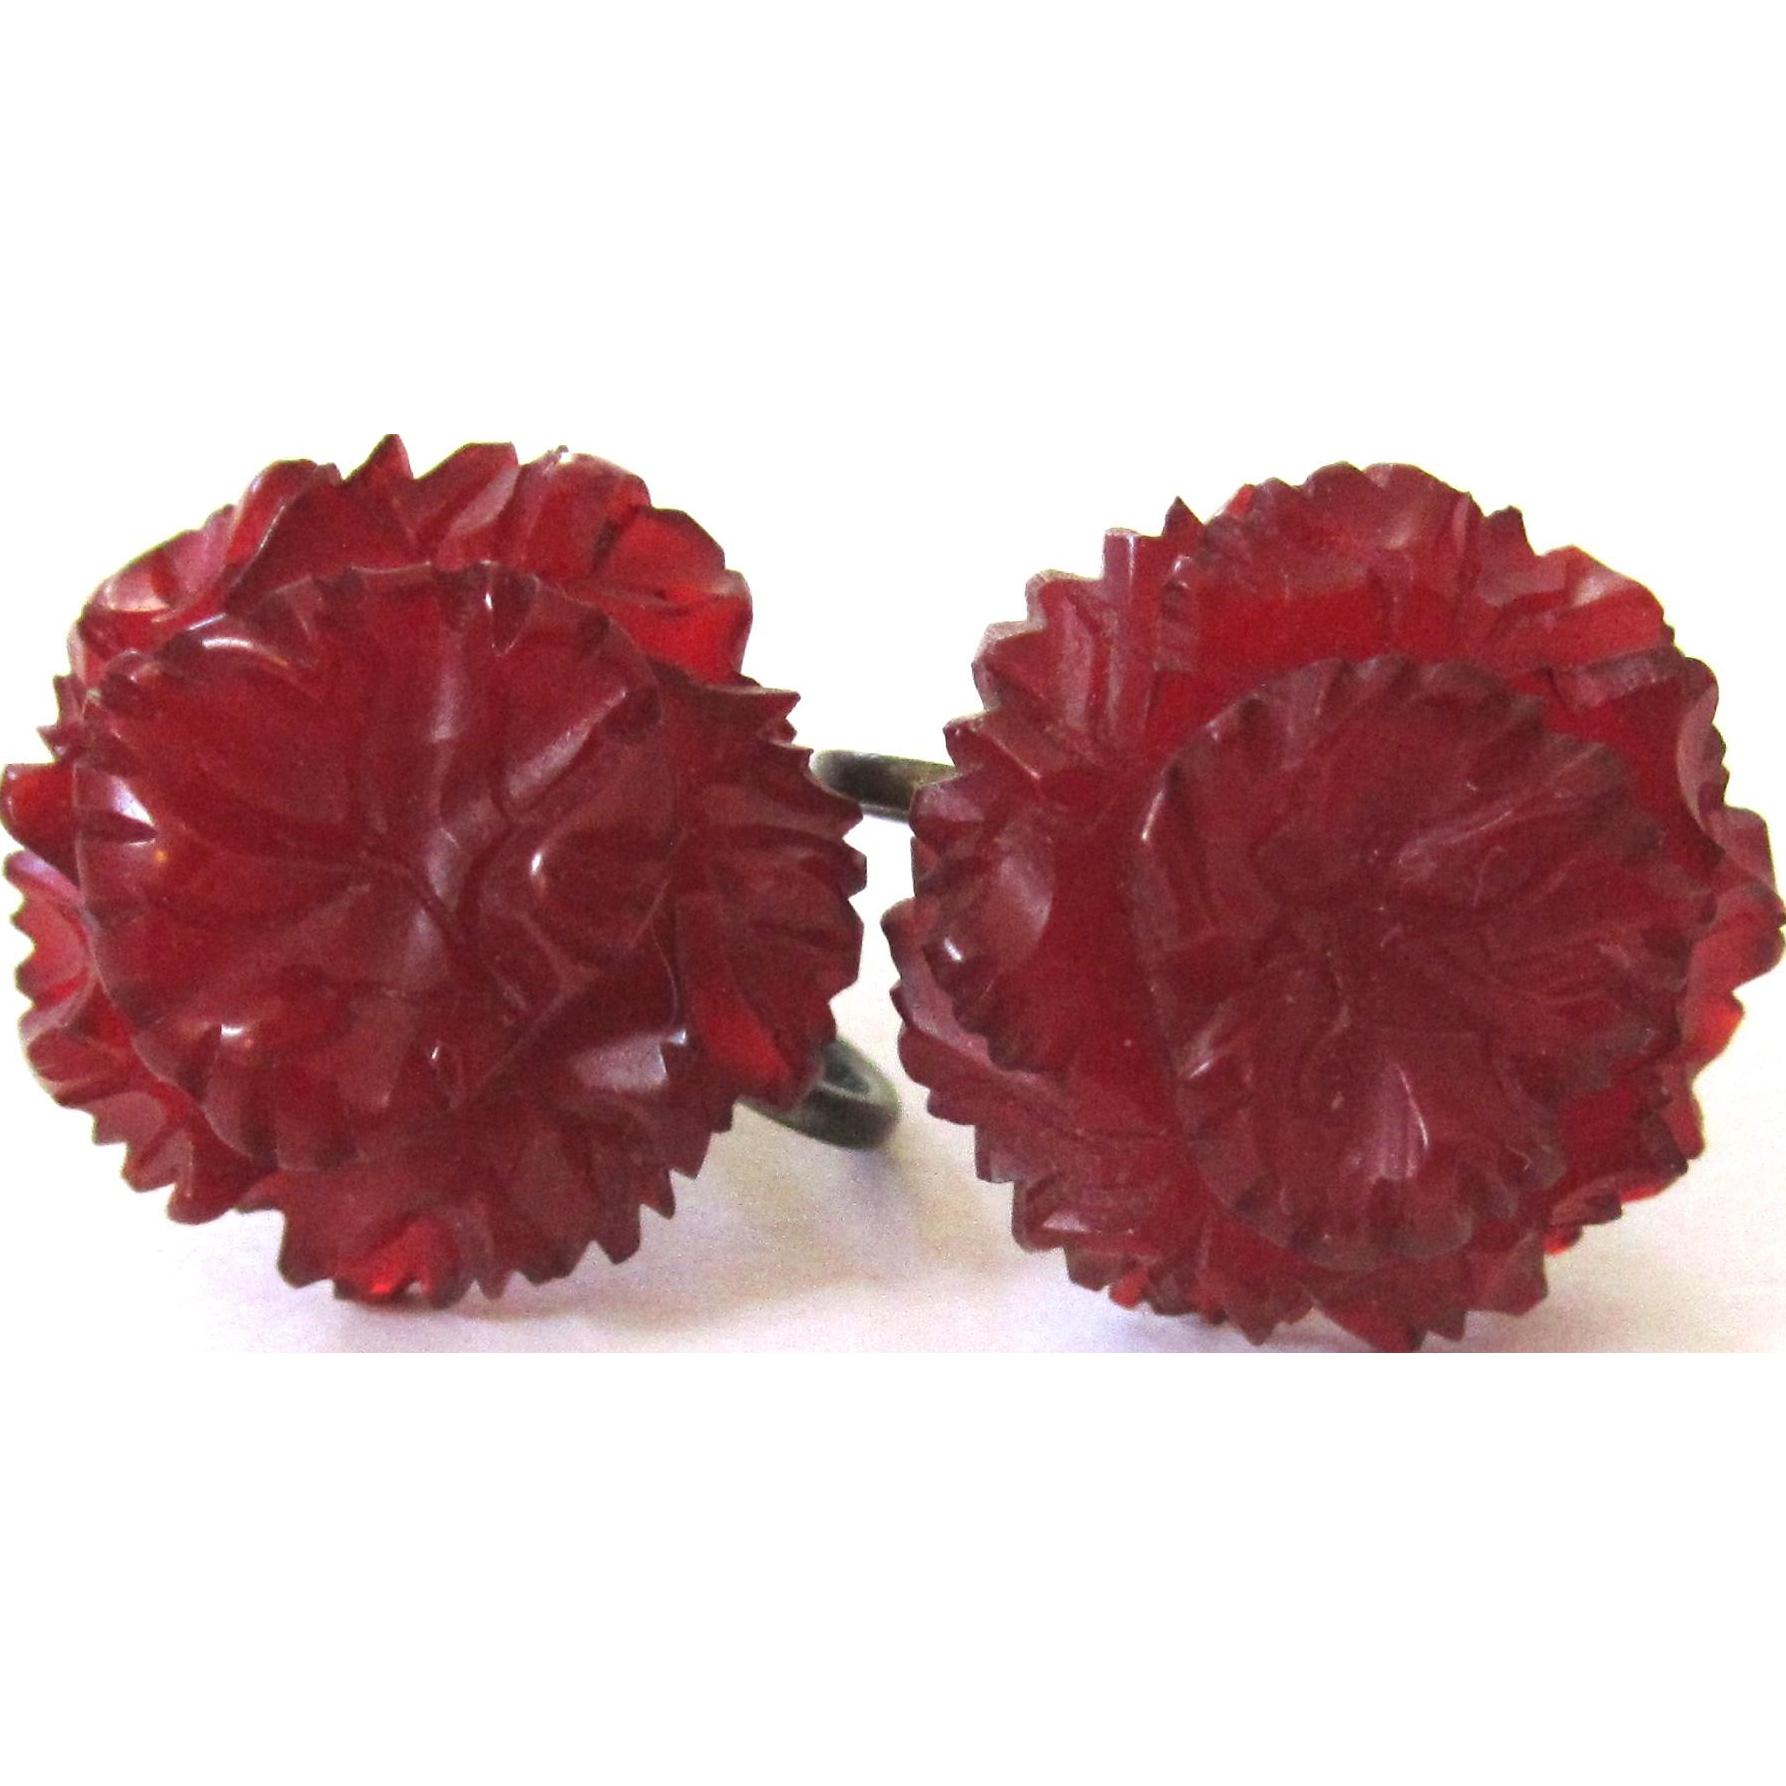 Intricately Carved Translucent Deep Red Bakelite Screw-back Earrings